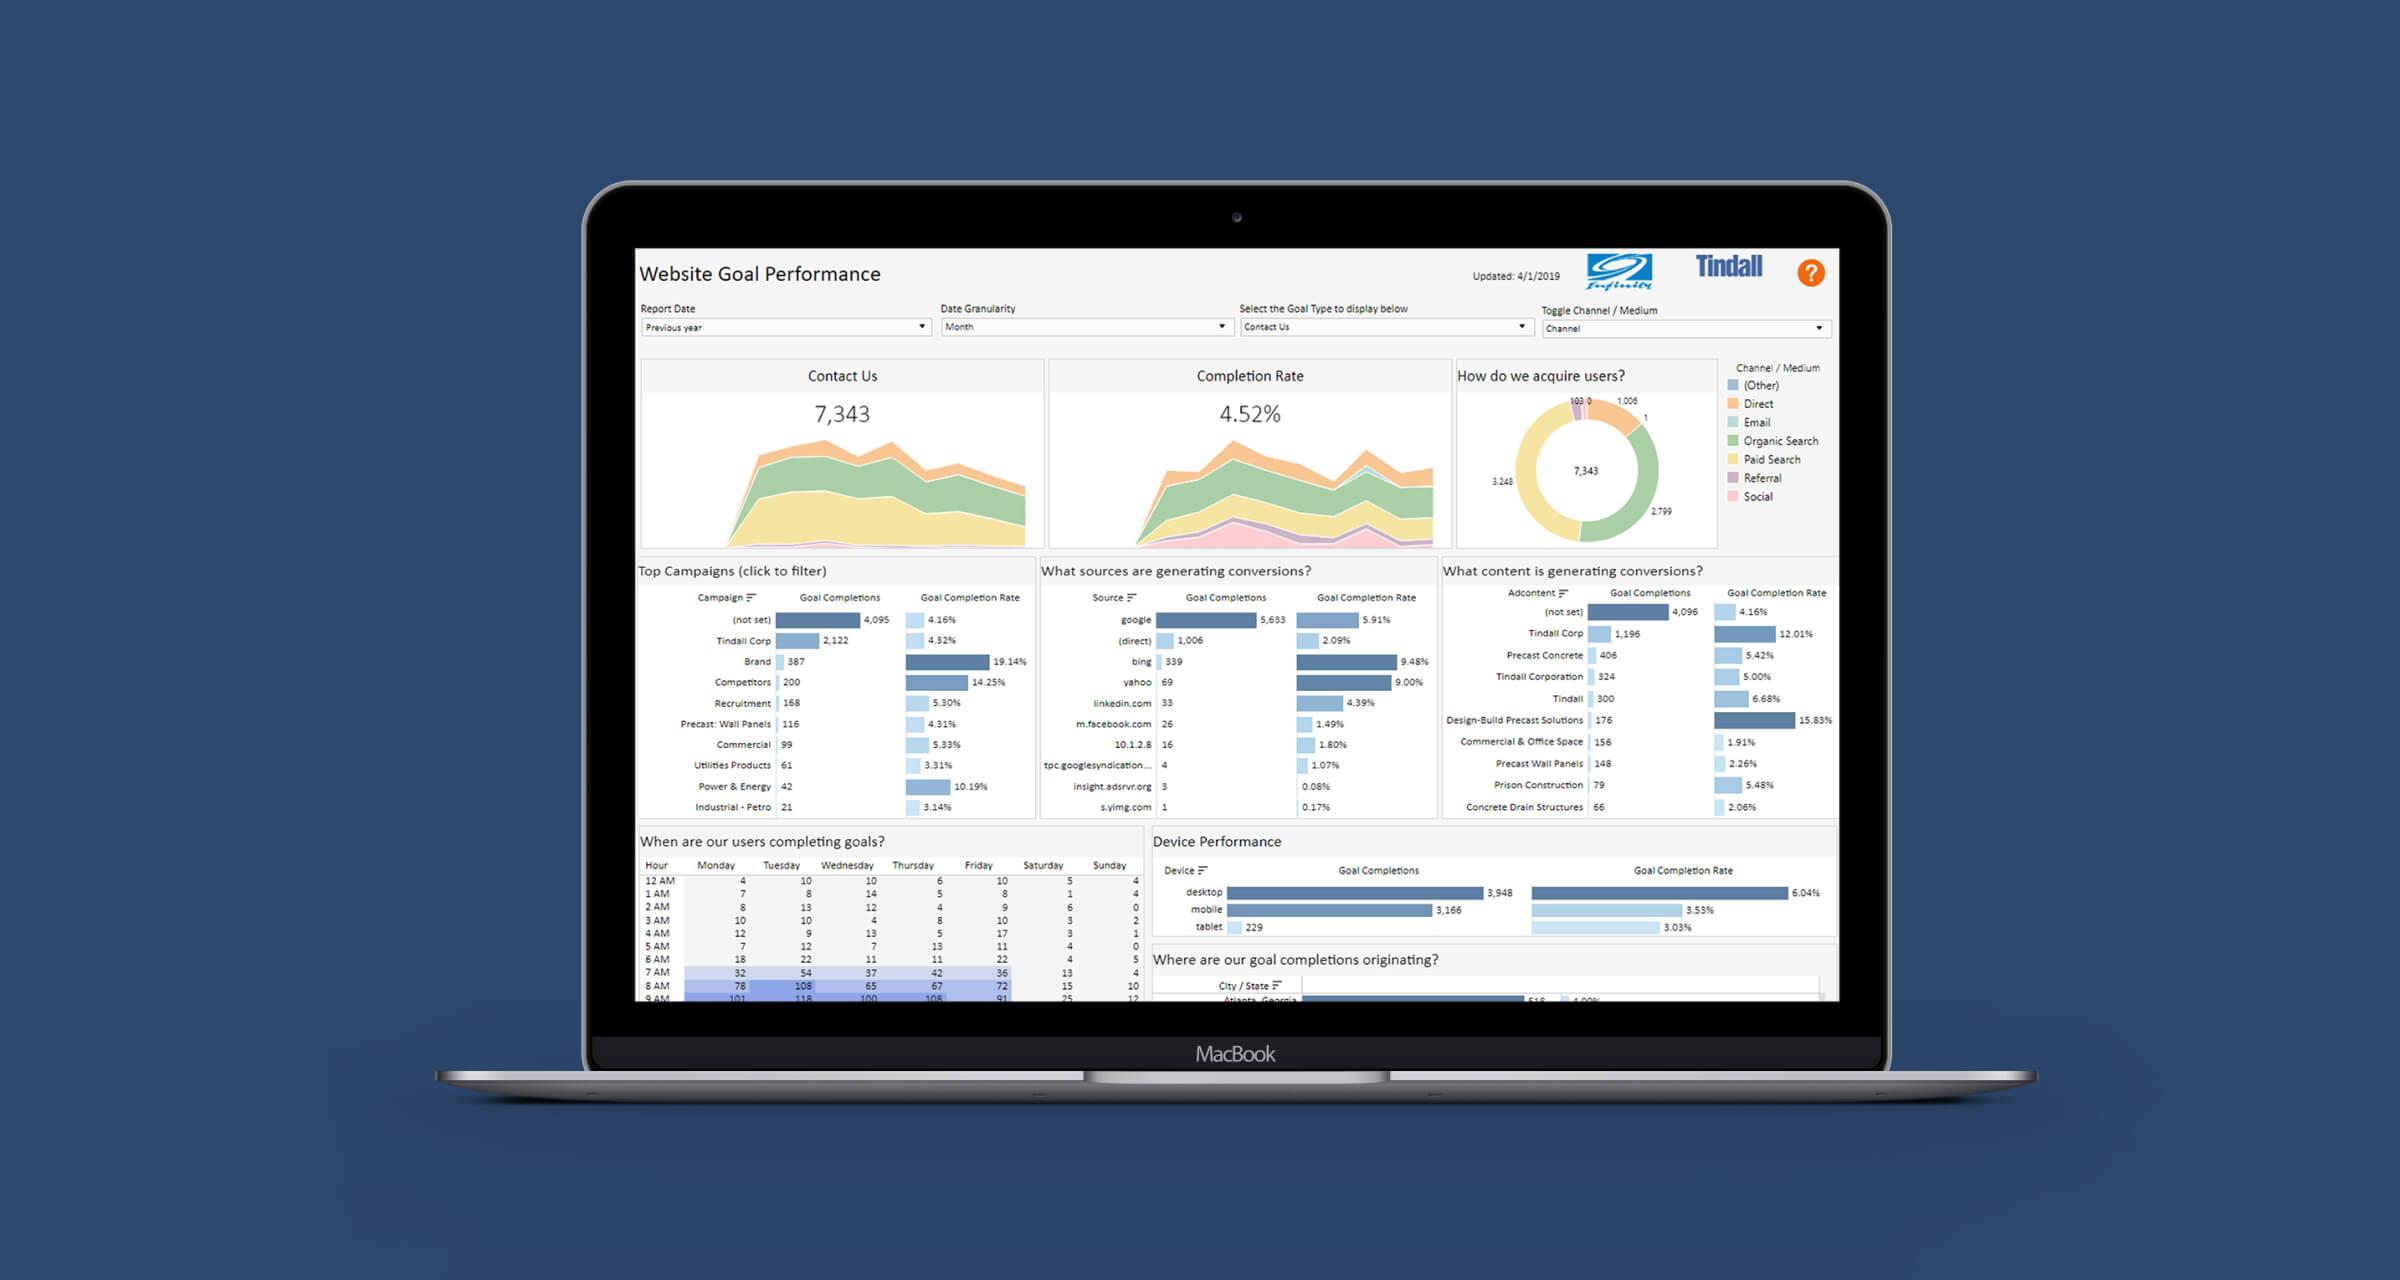 tindall-seo-analytics-dashboard-laptop